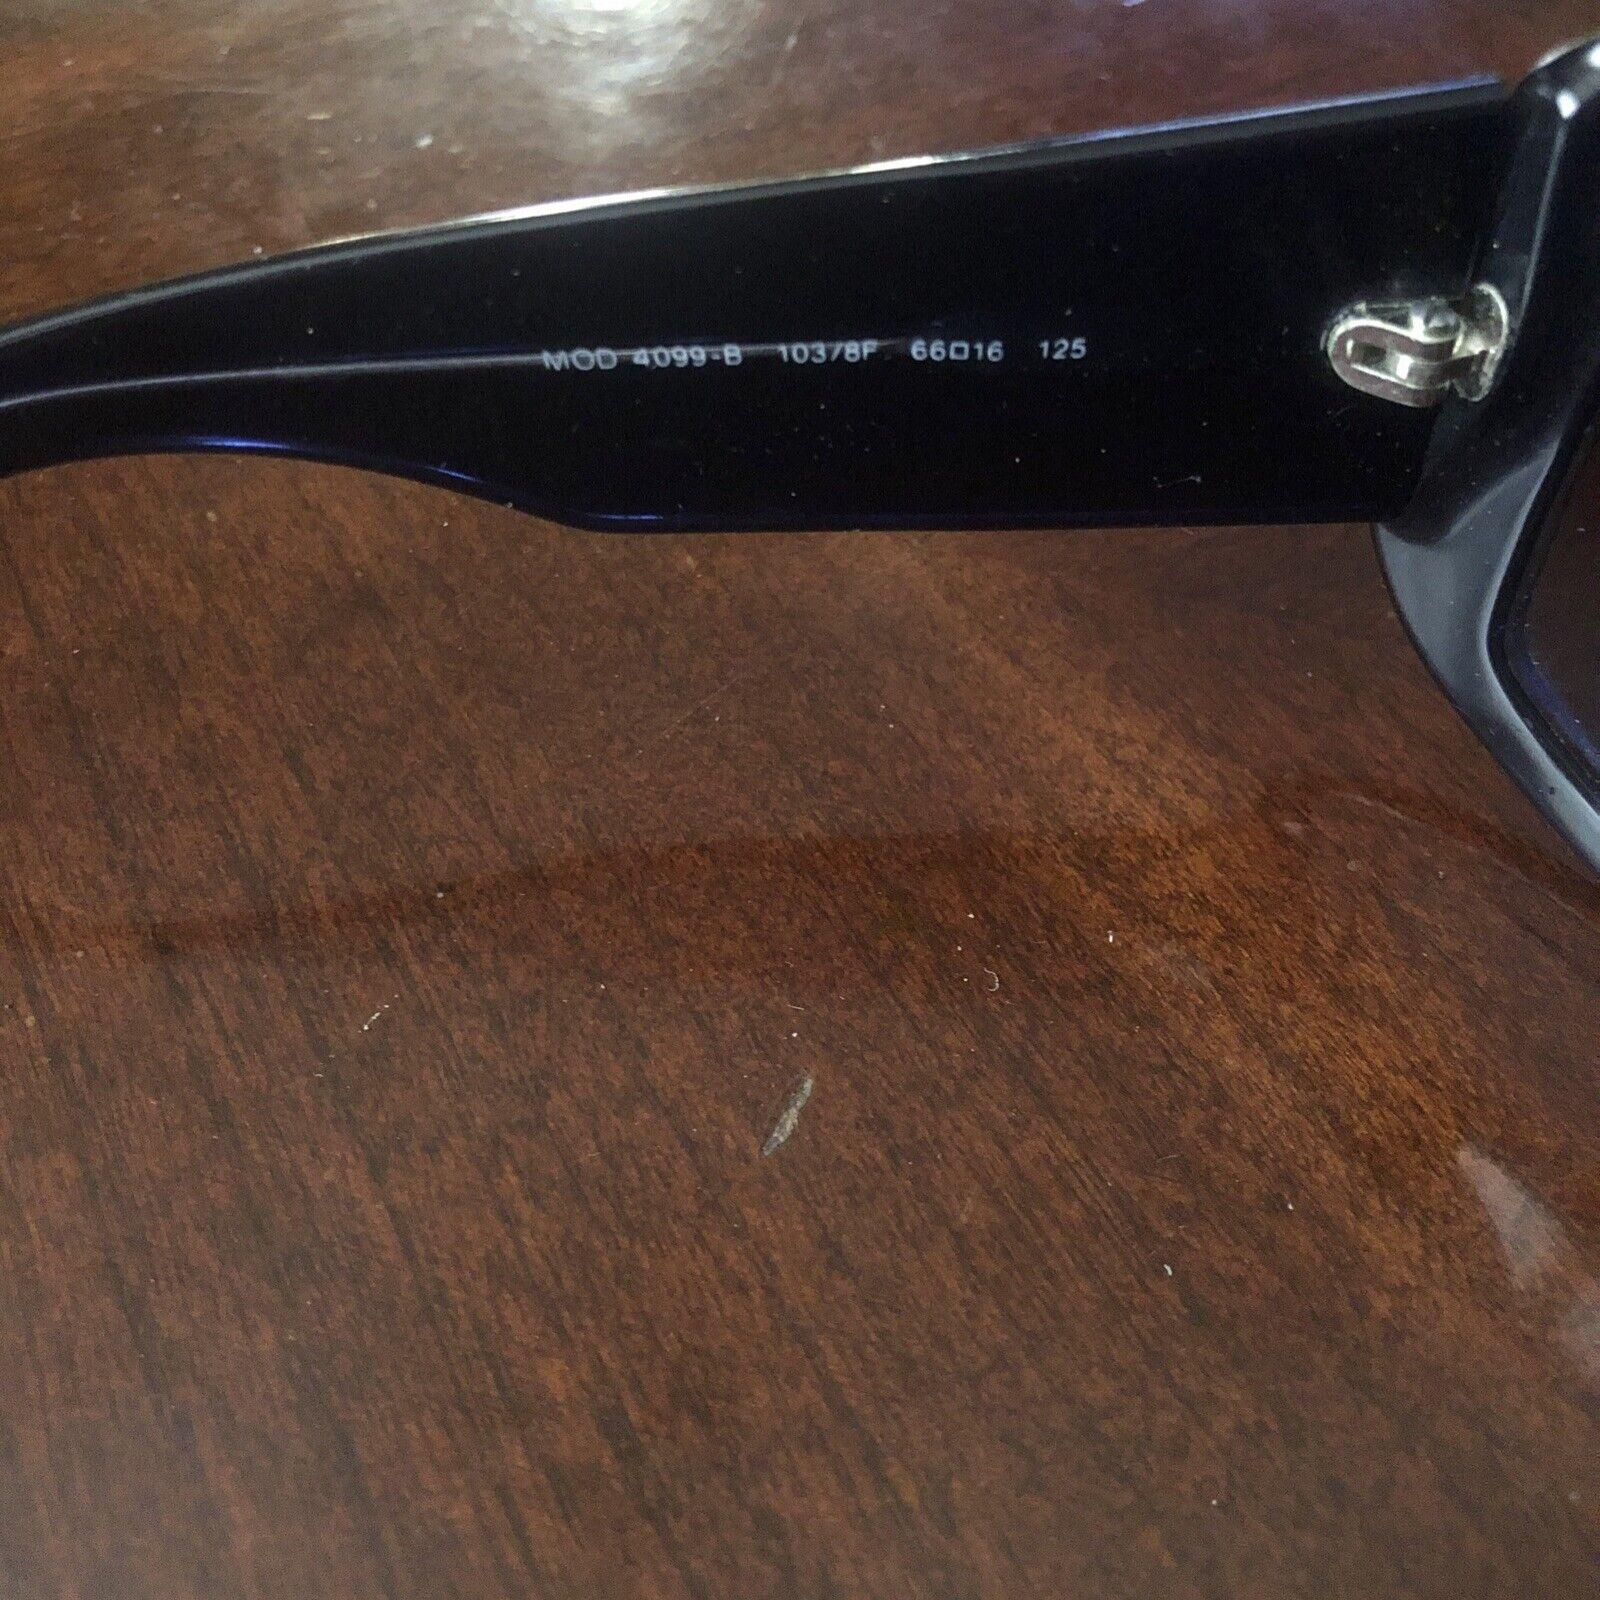 gianni versace sunglasses - image 7